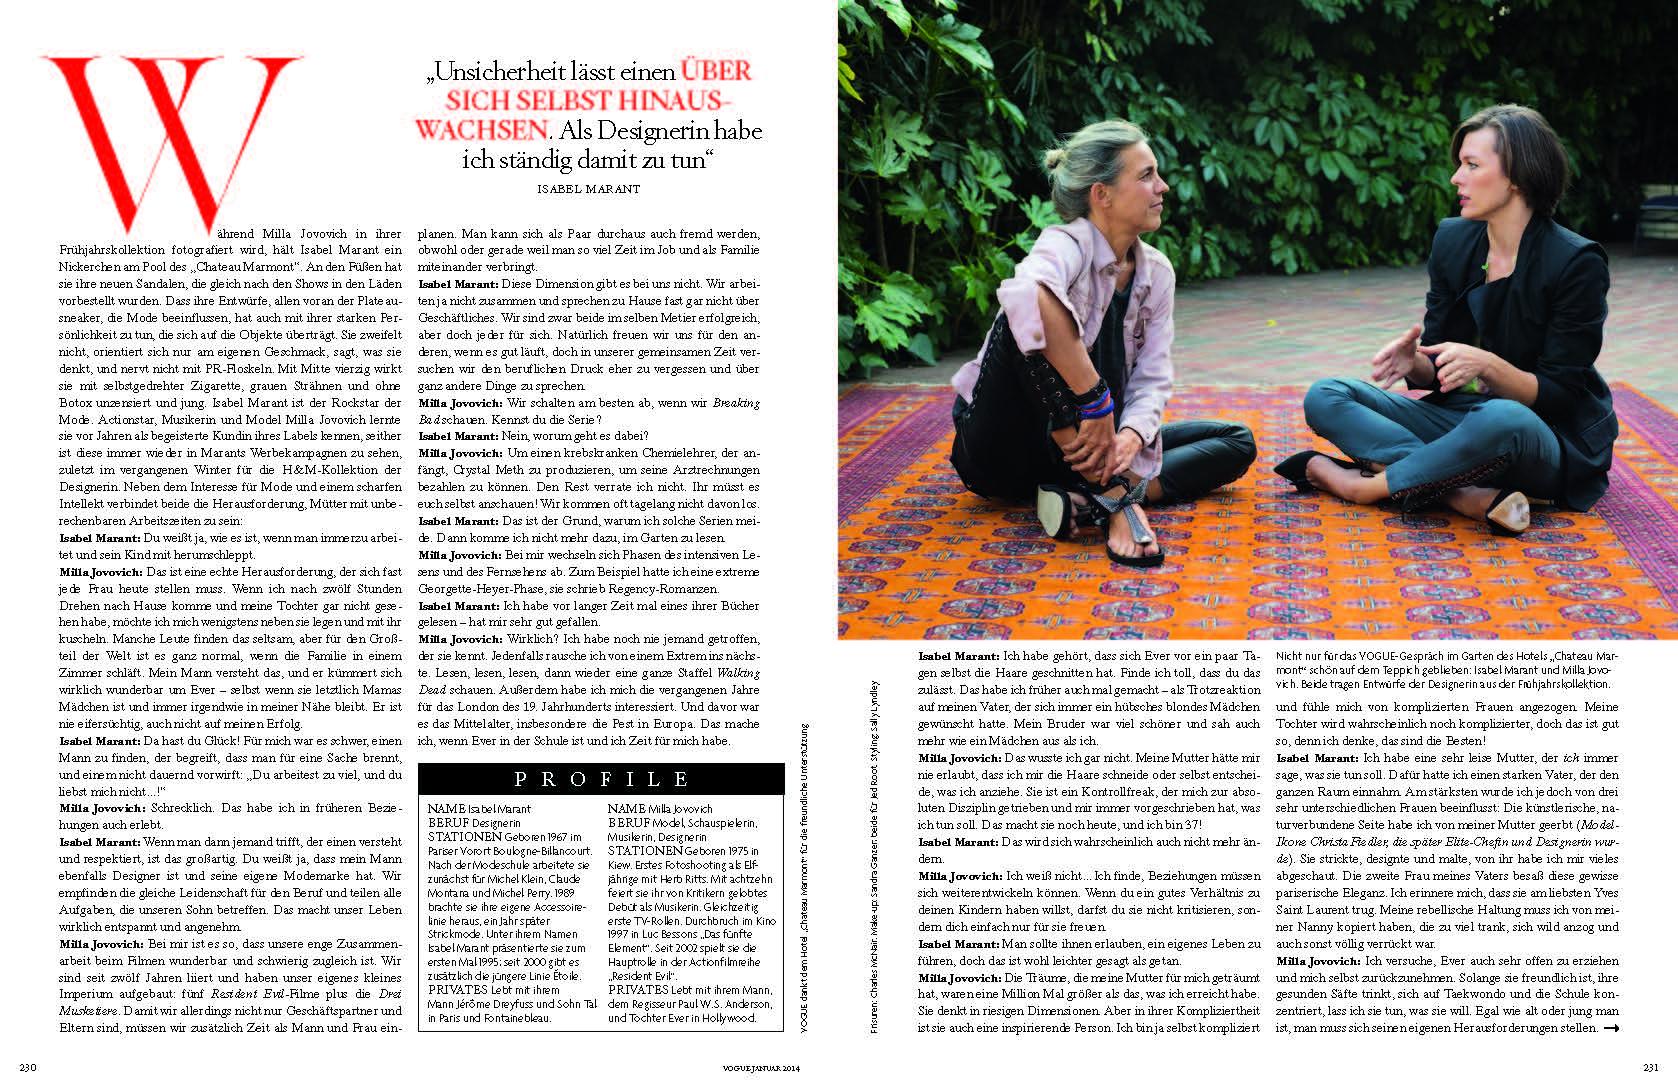 VOGUE Isabel Marant + Milla Jovovich